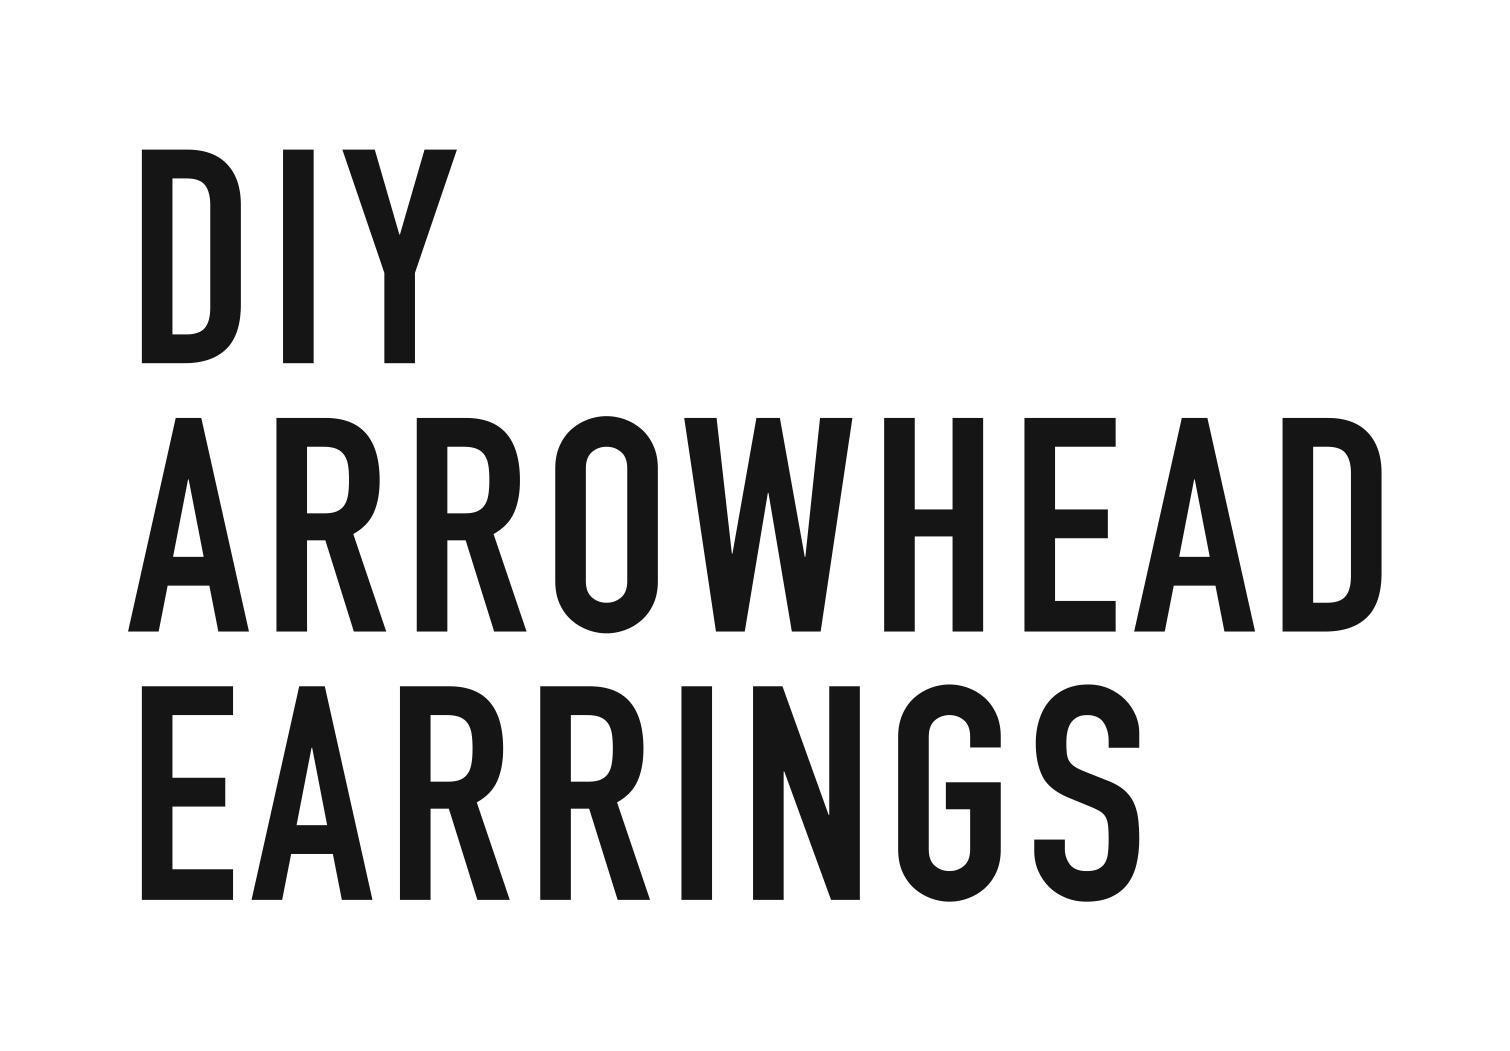 ArrowheadEarringsGraphic.png